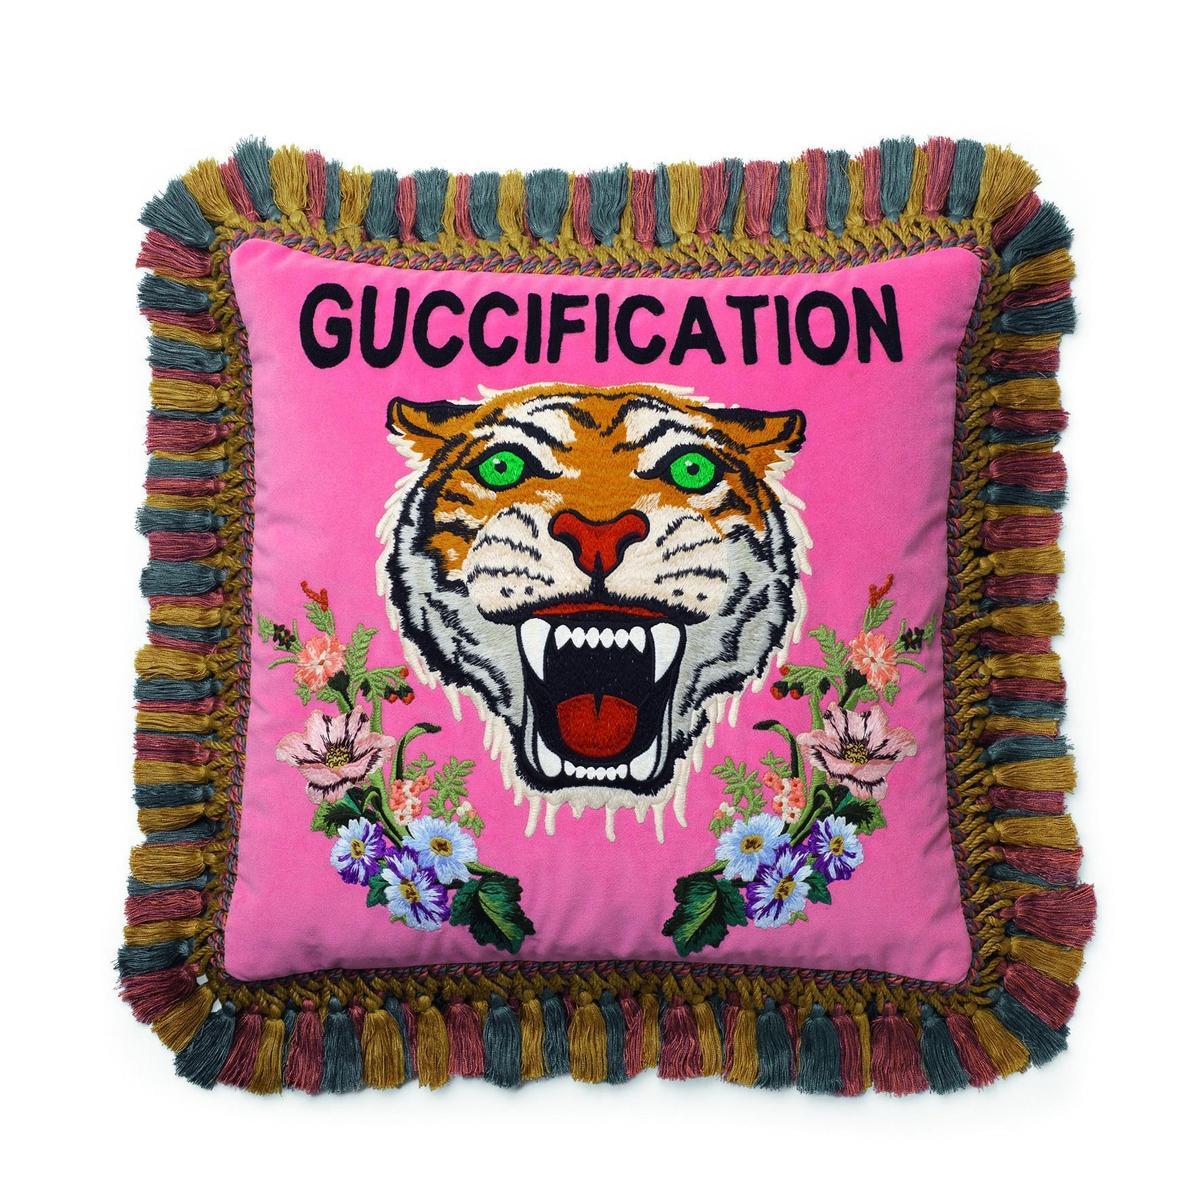 GUCCIFICATION虎頭刺繡抱枕,NT$54,000。(品牌提供)